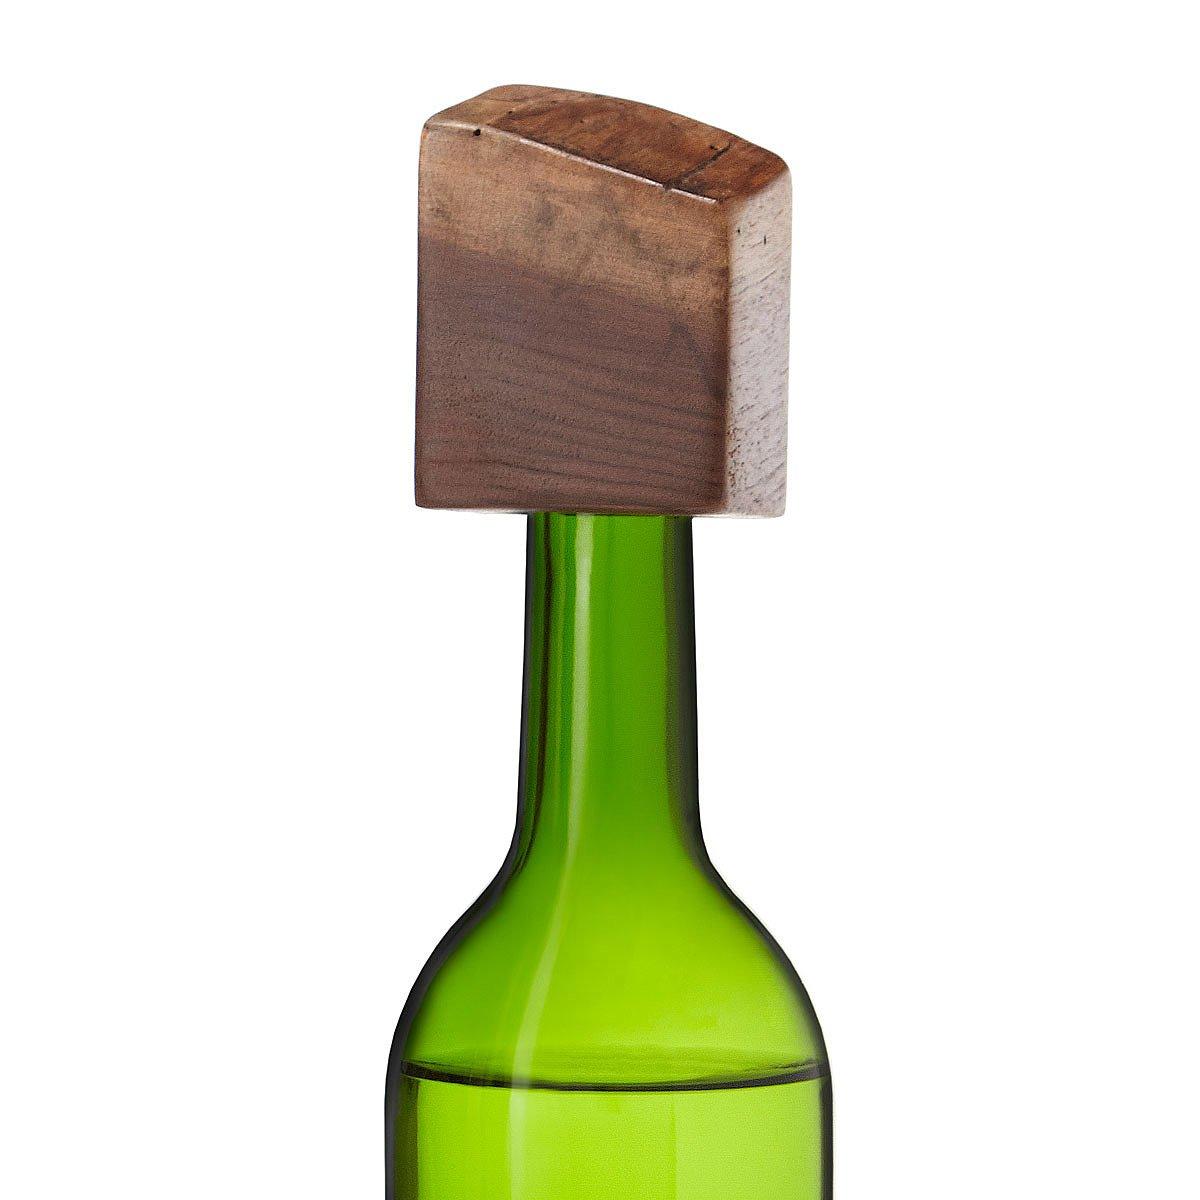 Live Edge Bottle Stopper | wooden wine stopper | UncommonGoods